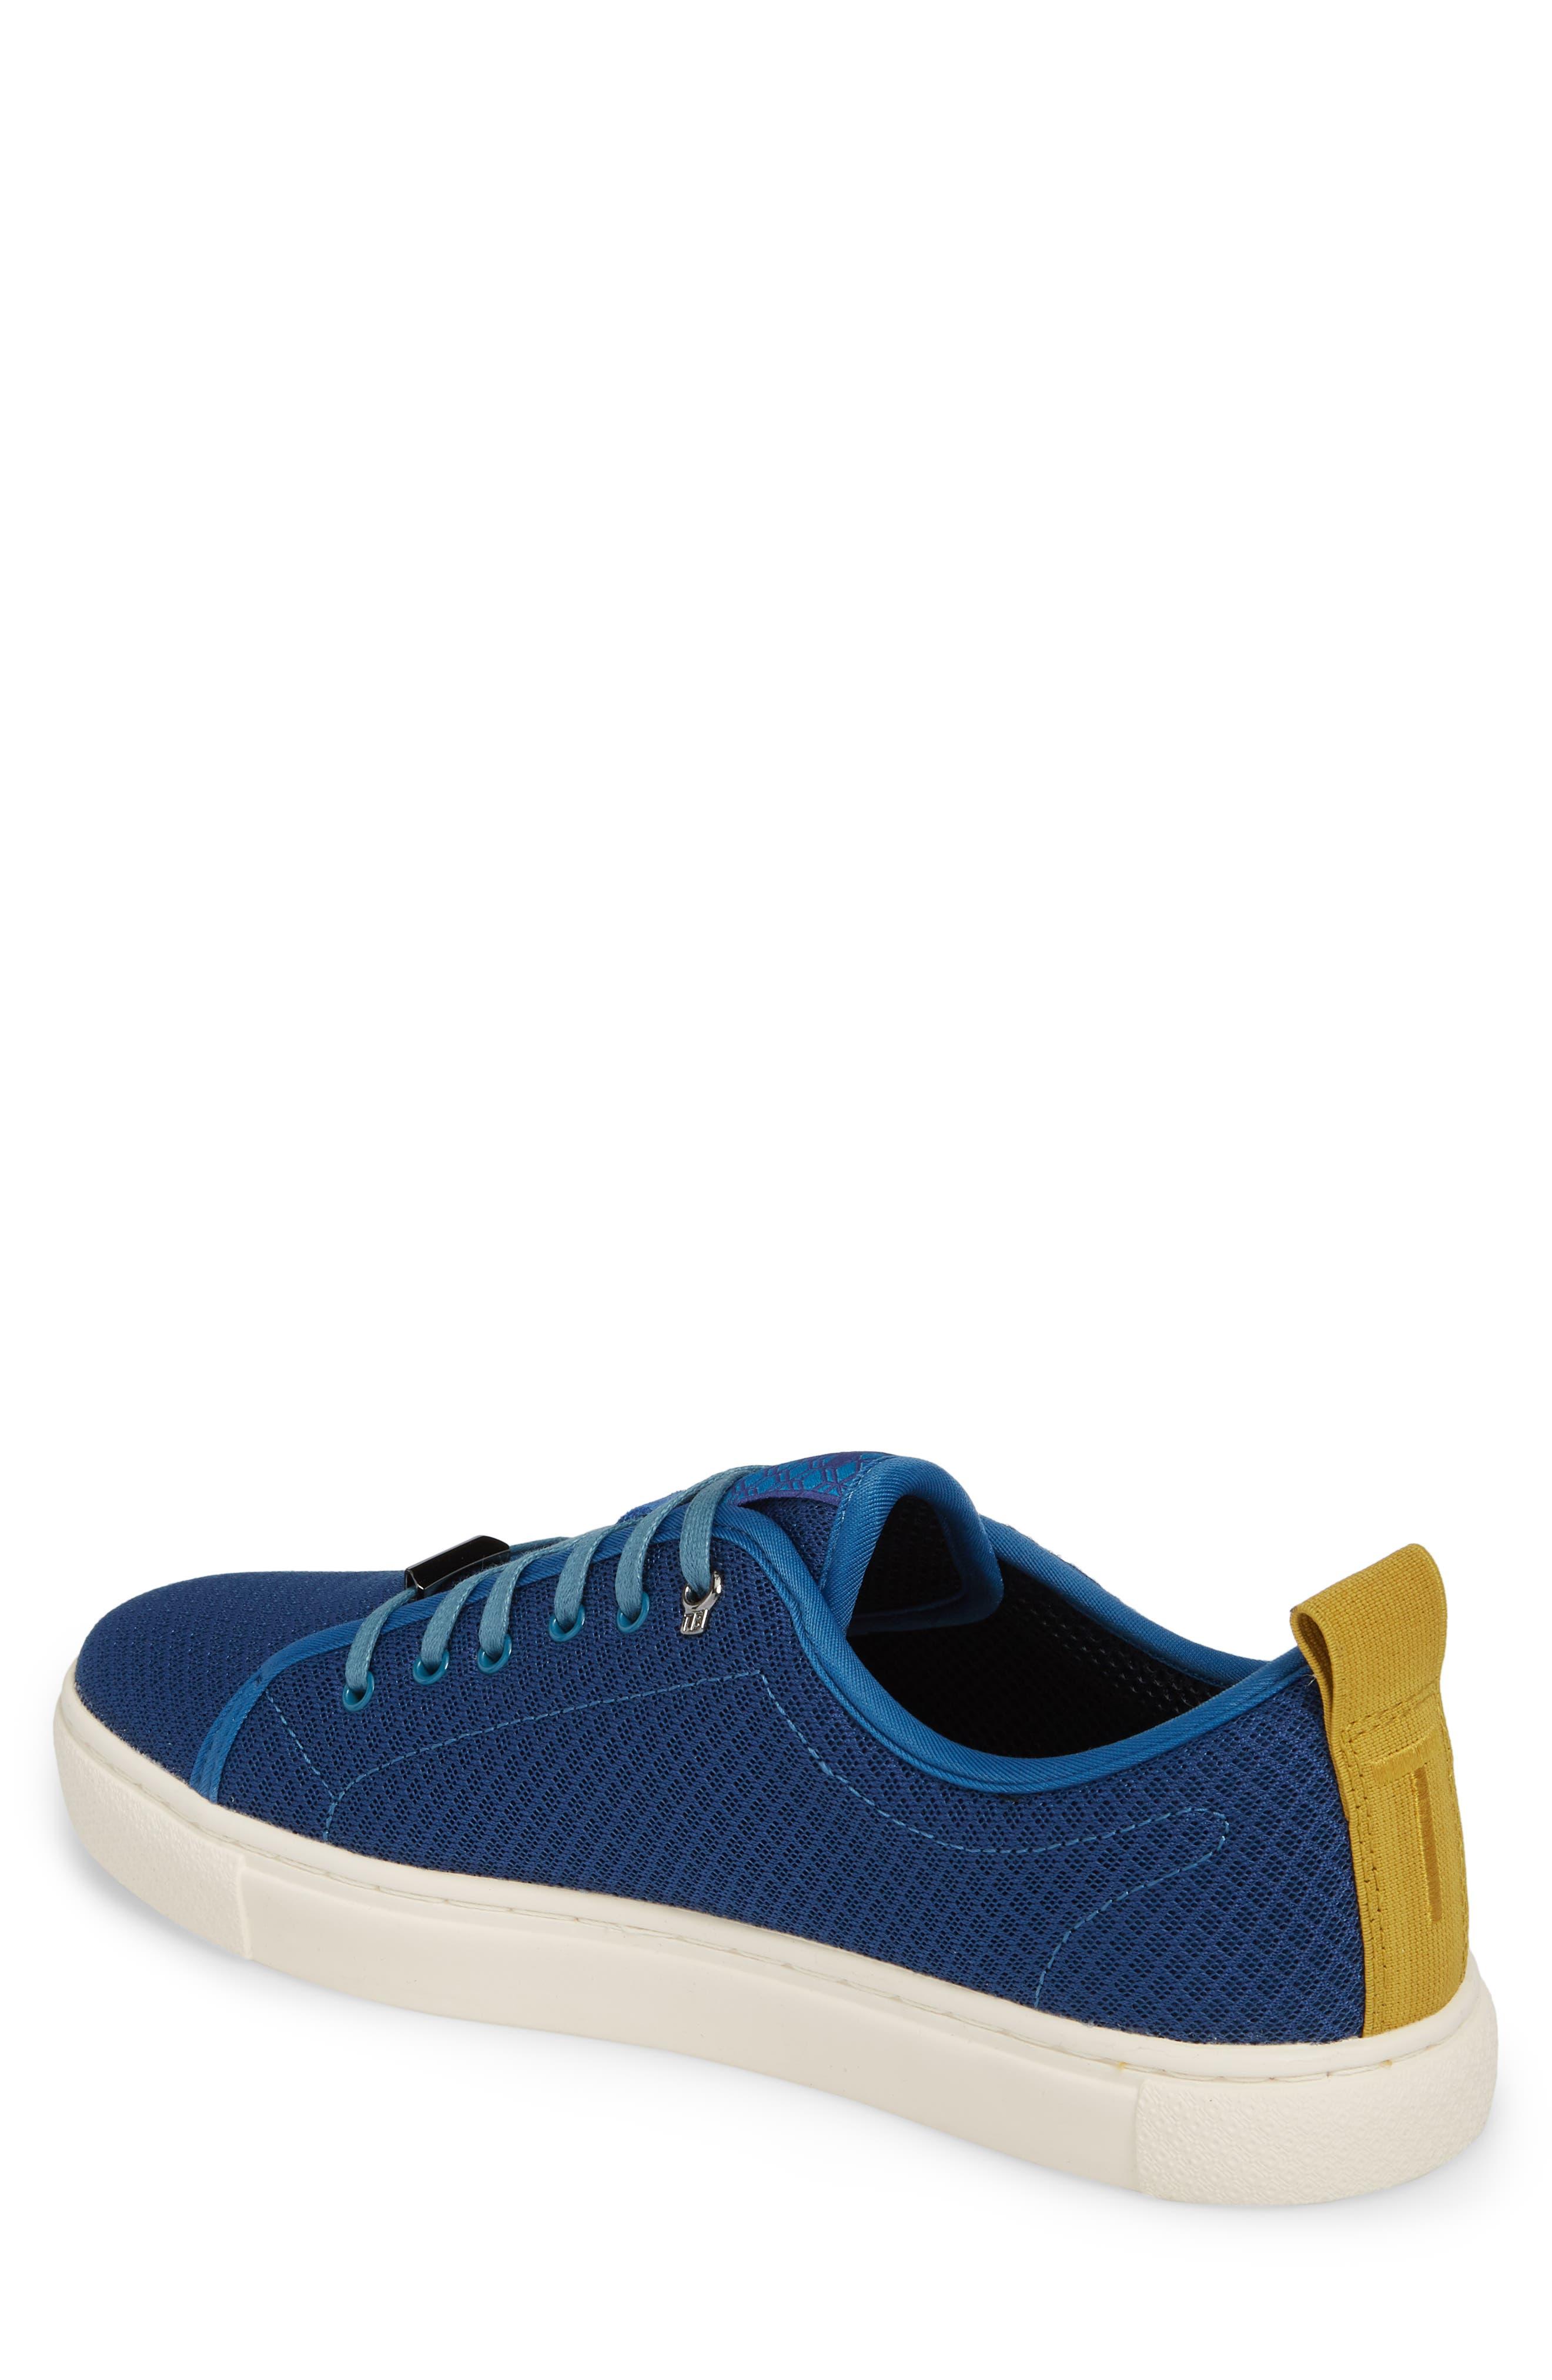 Lannse Low Top Mesh Sneaker,                             Alternate thumbnail 2, color,                             454